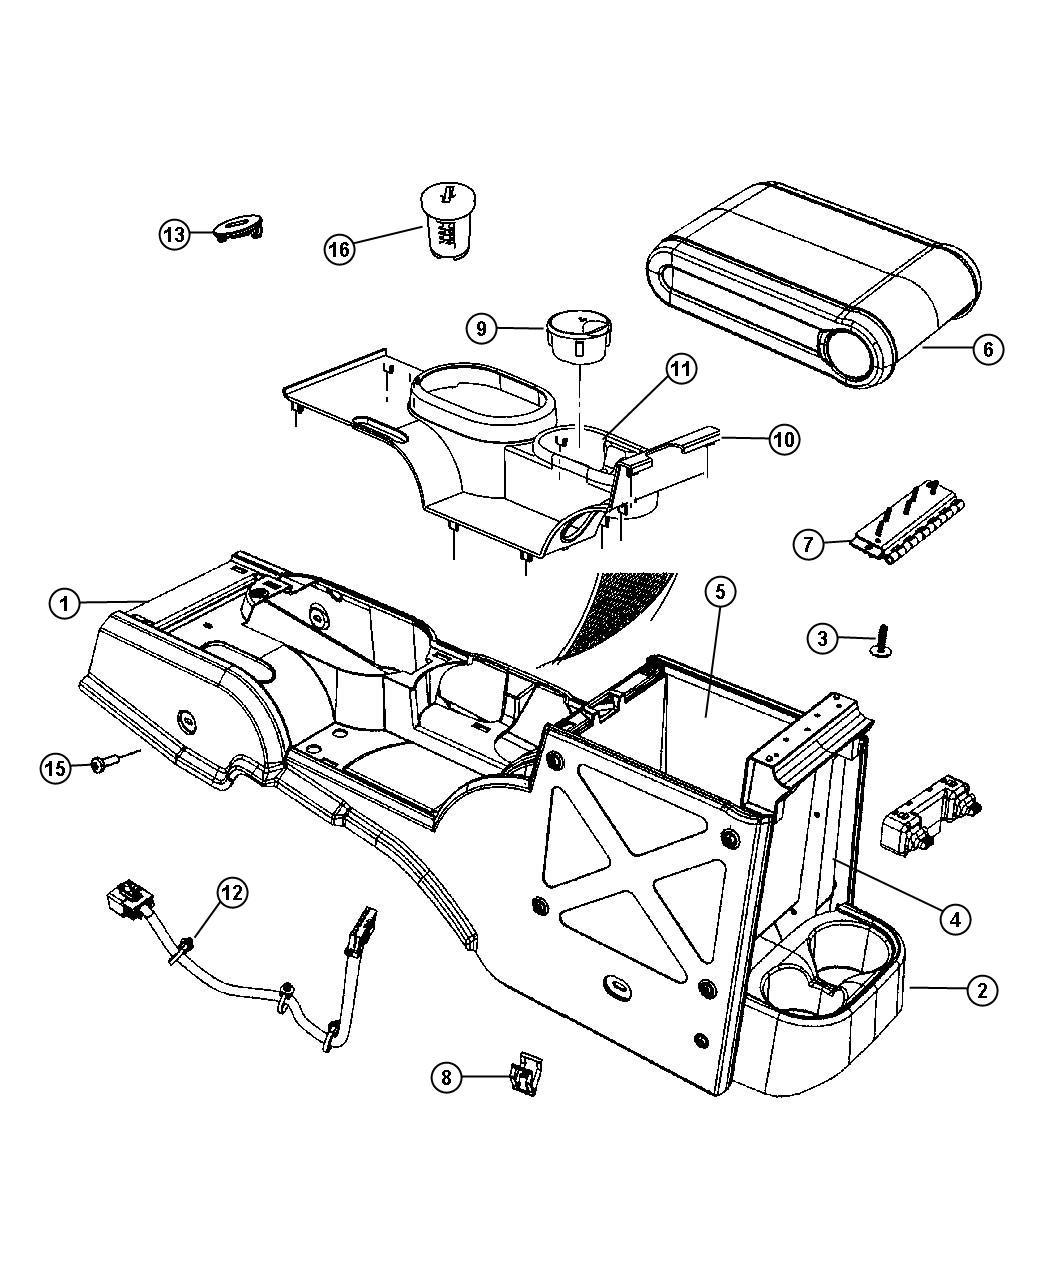 2008 Jeep Wrangler Bezel, panel. Console, floor console